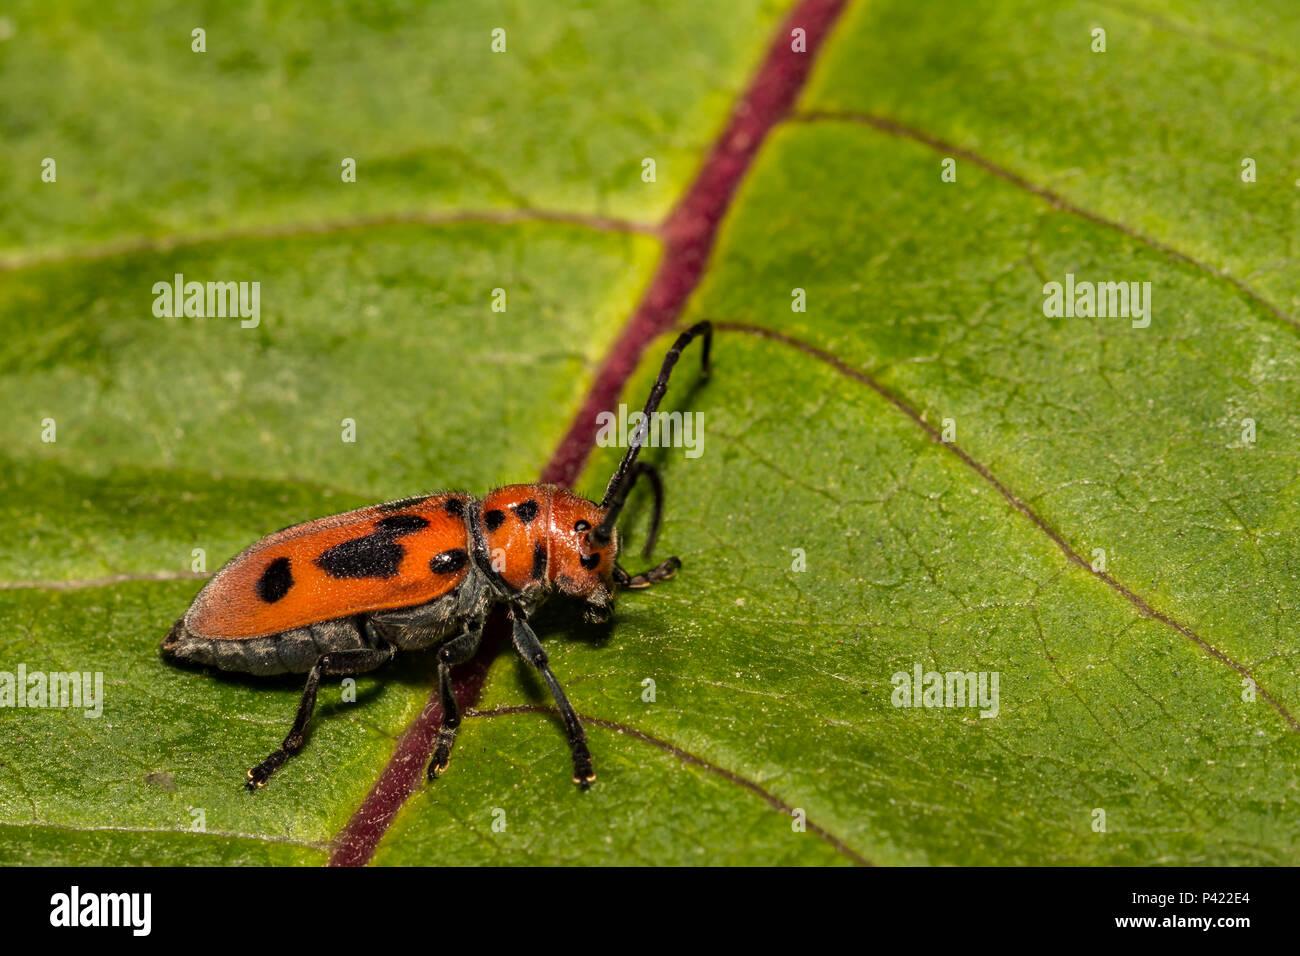 Red Milkweed Beetle (Tetraopes tetrophthalmus) - Stock Image